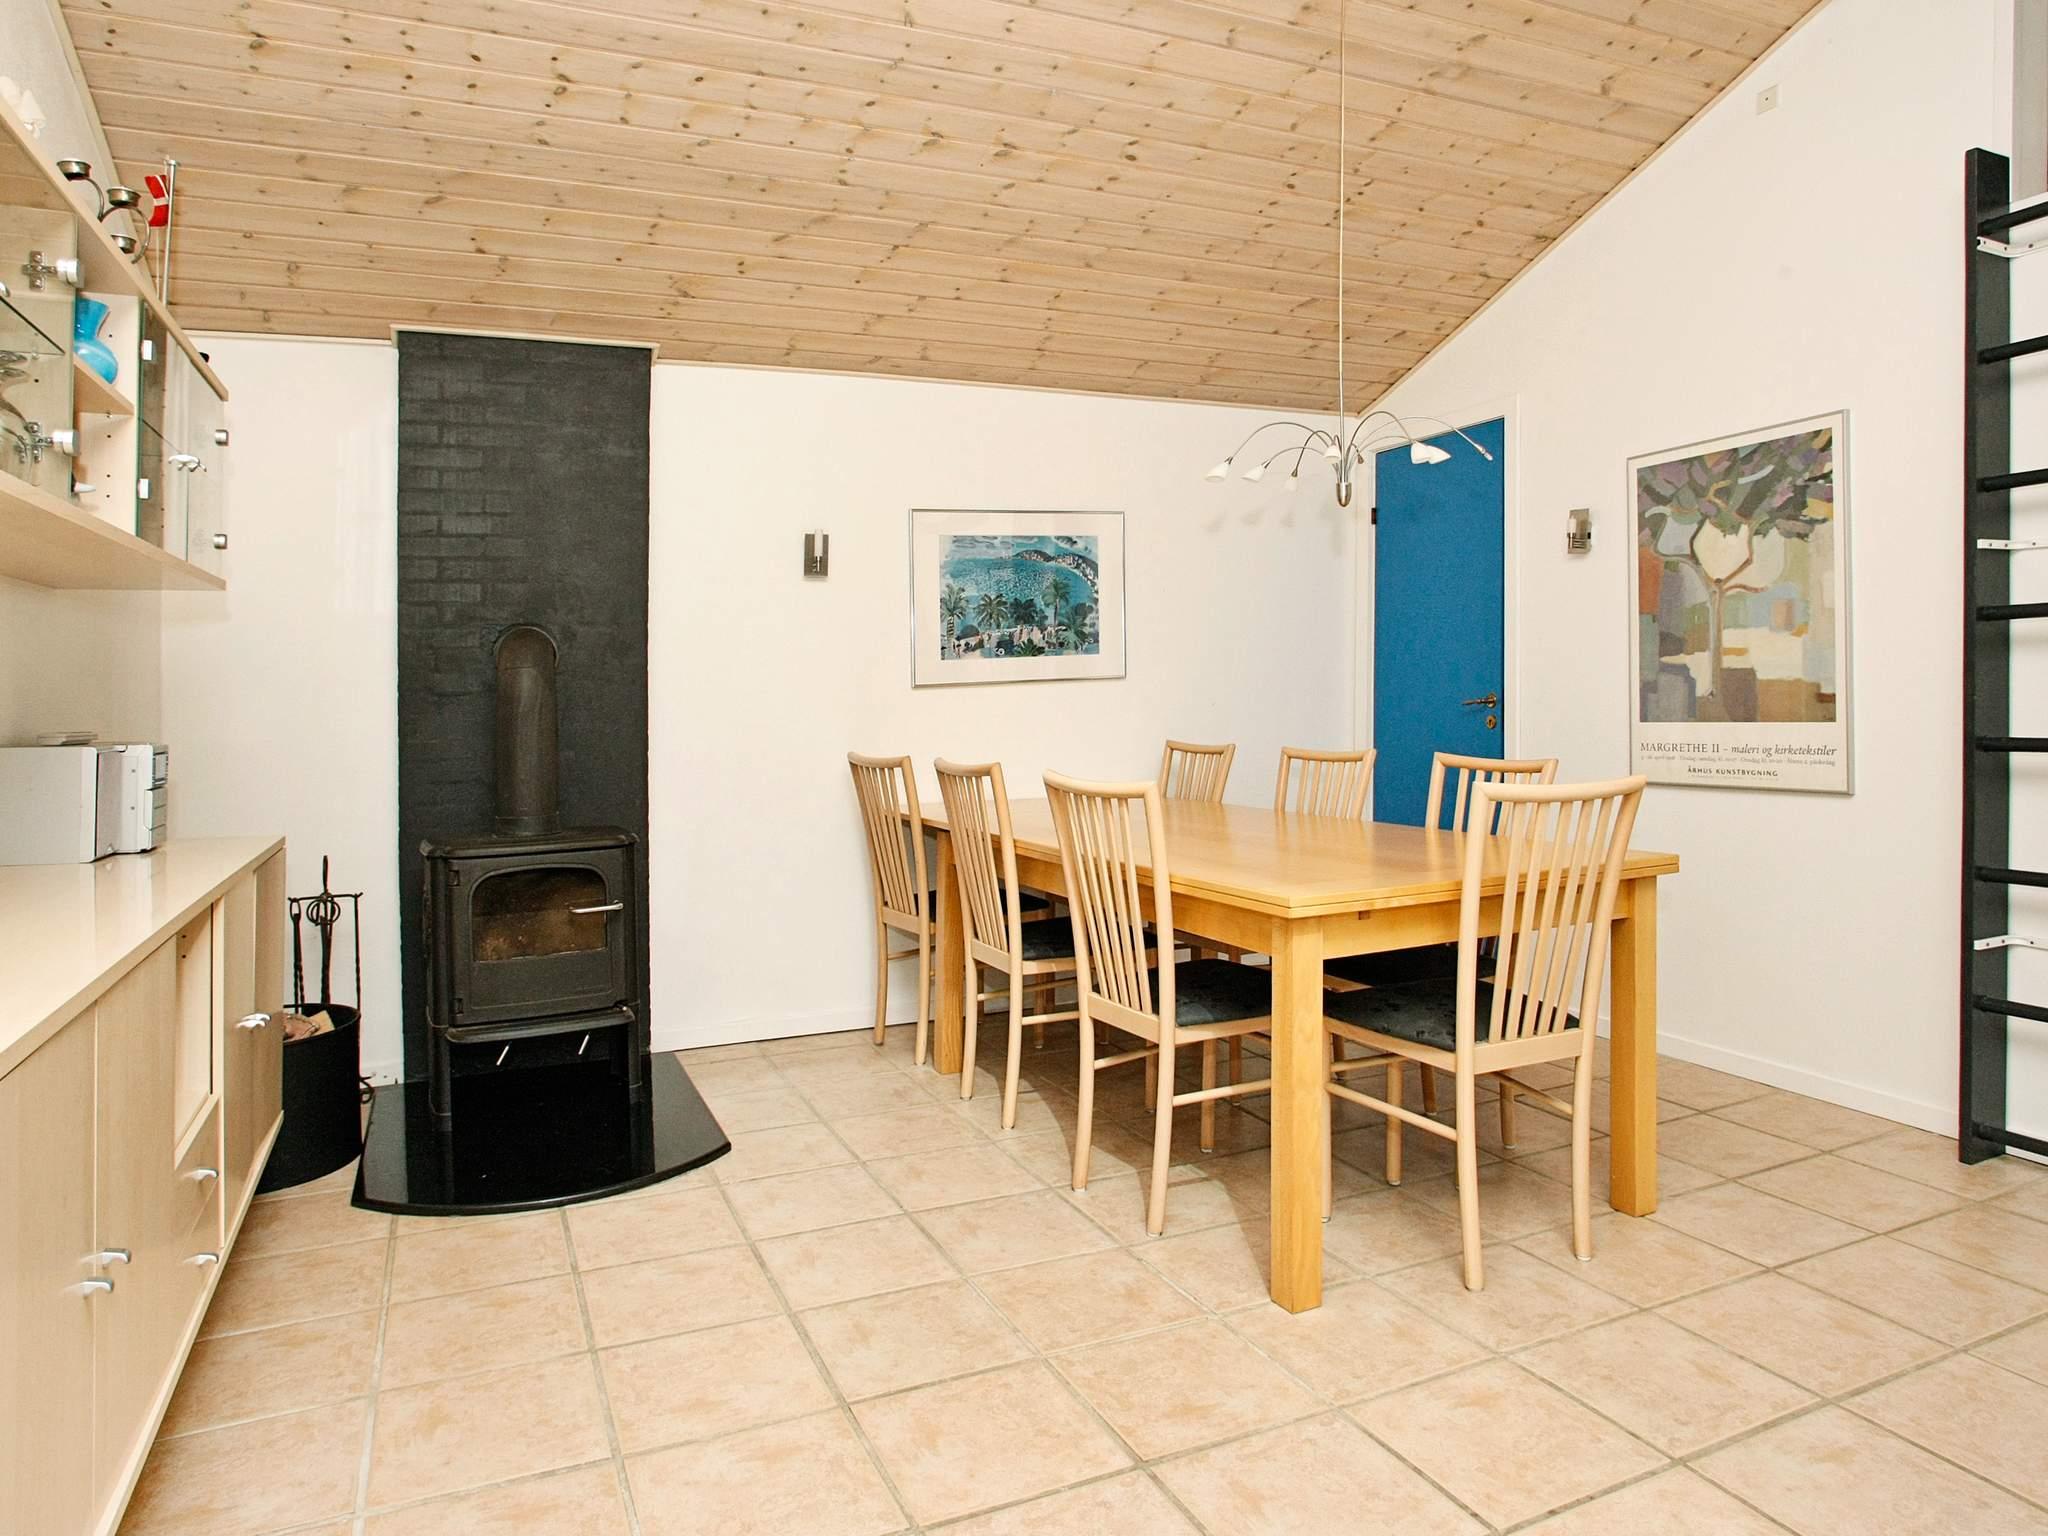 Ferienhaus Nr. Lyngby (89445), Løkken, , Nordwestjütland, Dänemark, Bild 2